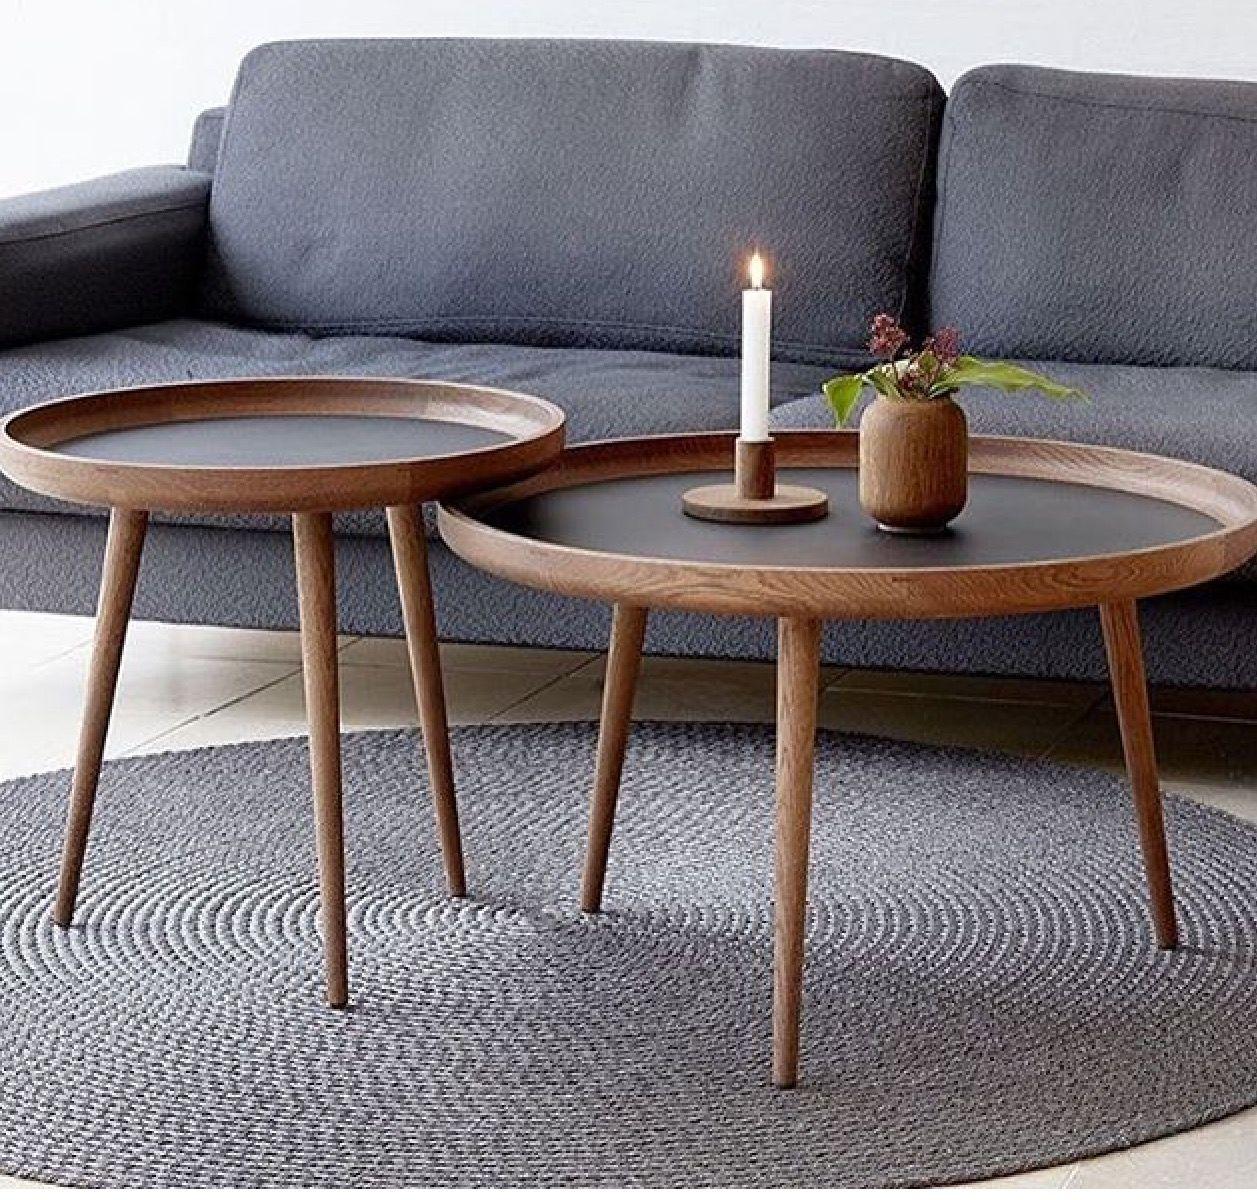 Tisch Design Signe Blomquist Scandinavian Design Produced In Denmark For Applicata Applicata Sitting Room Design Centre Table Design Wood Coffe Table [ 1200 x 1257 Pixel ]